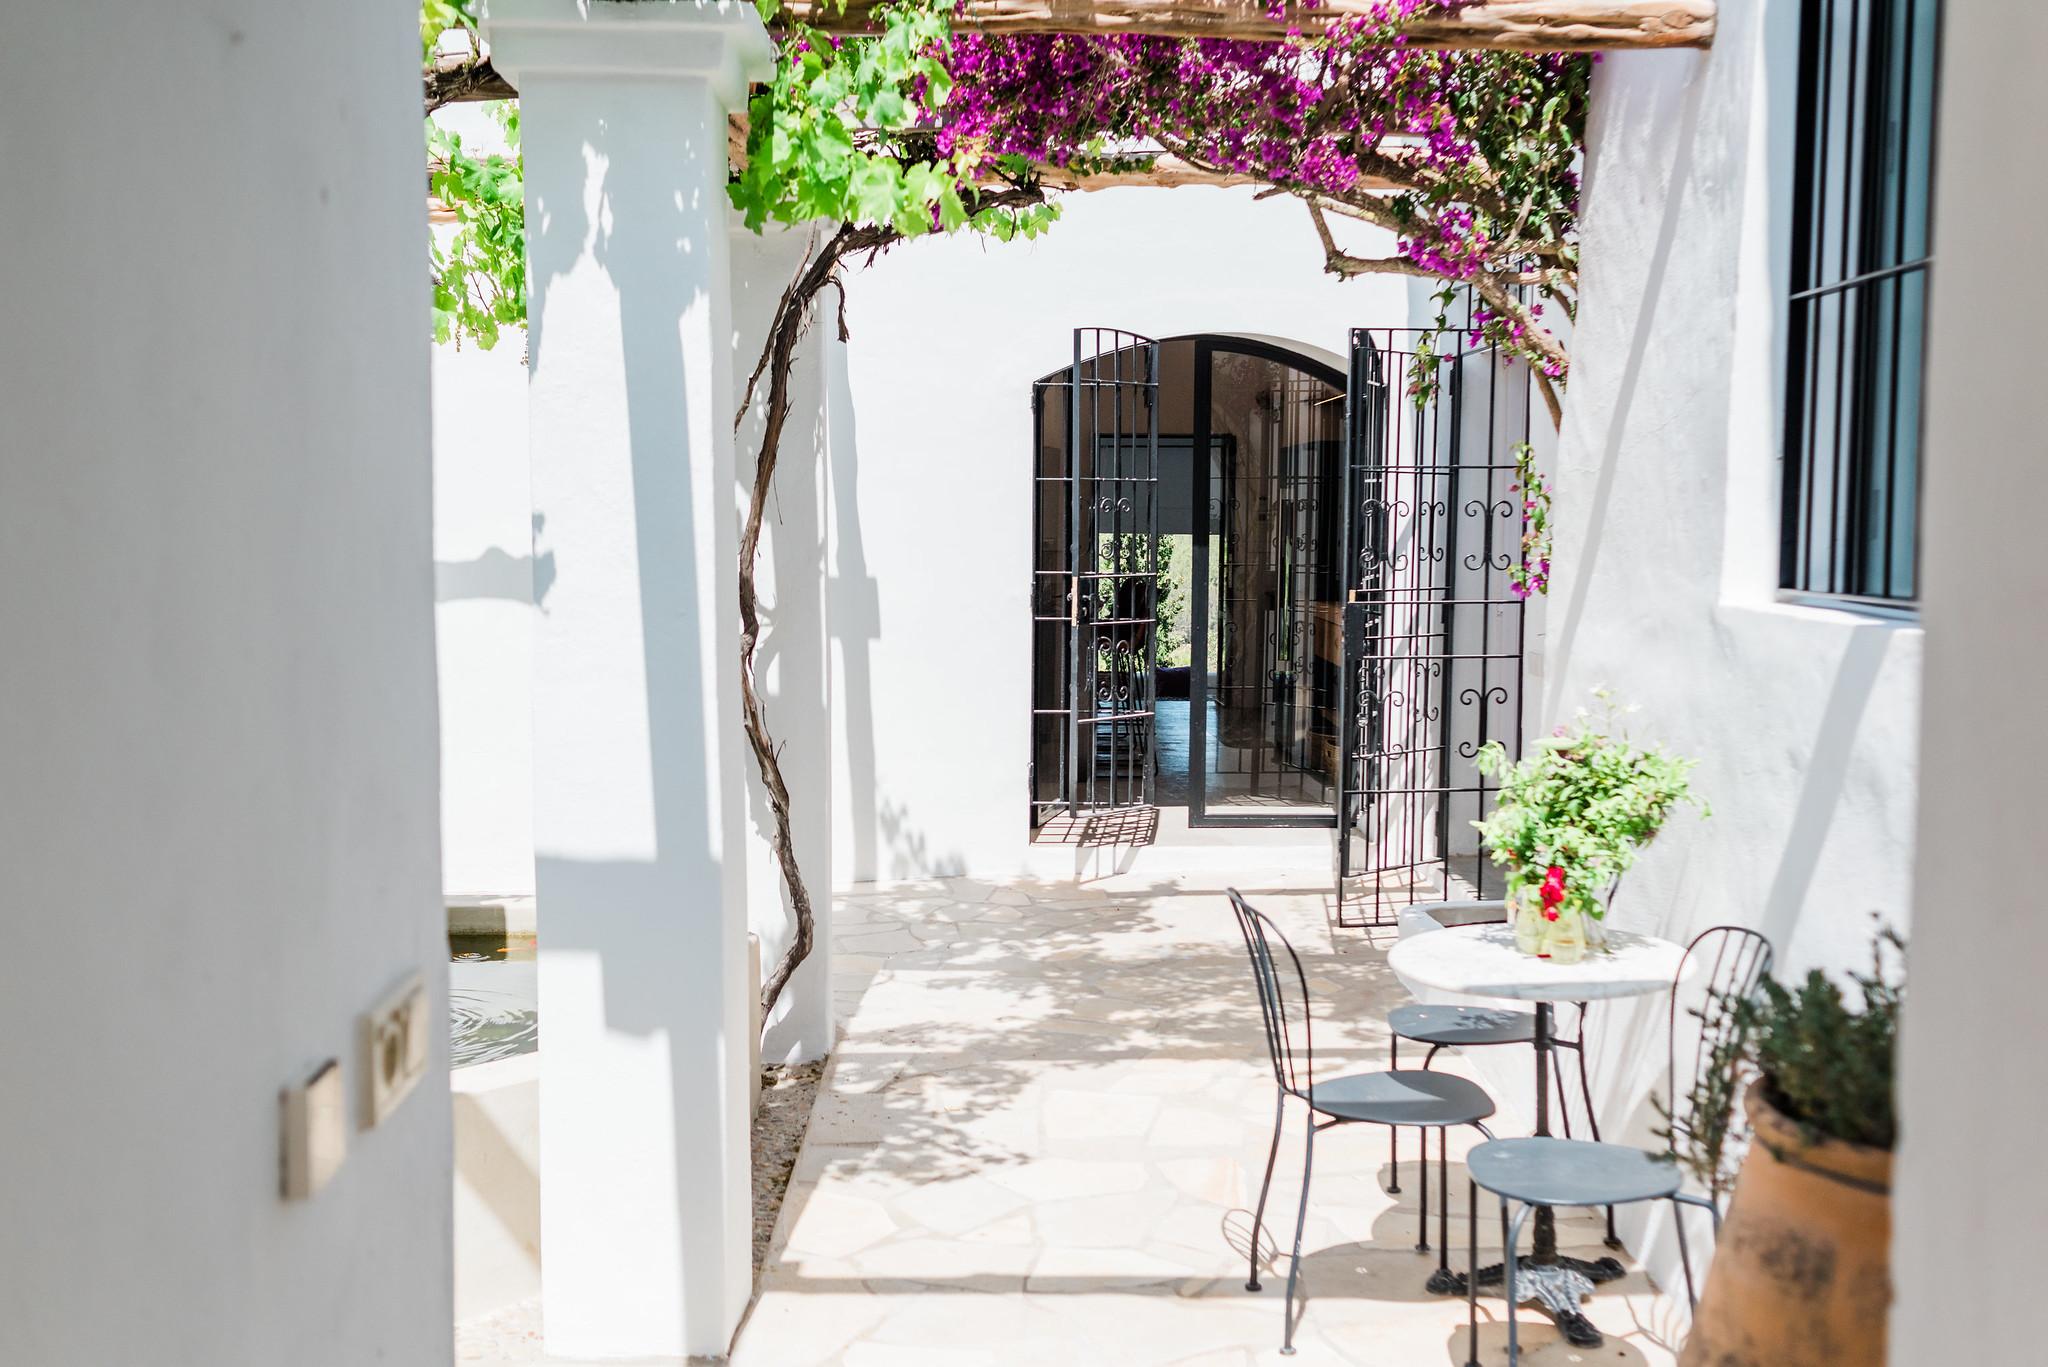 https://www.white-ibiza.com/wp-content/uploads/2020/06/white-ibiza-villas-can-calma-exterior-corridor.jpg